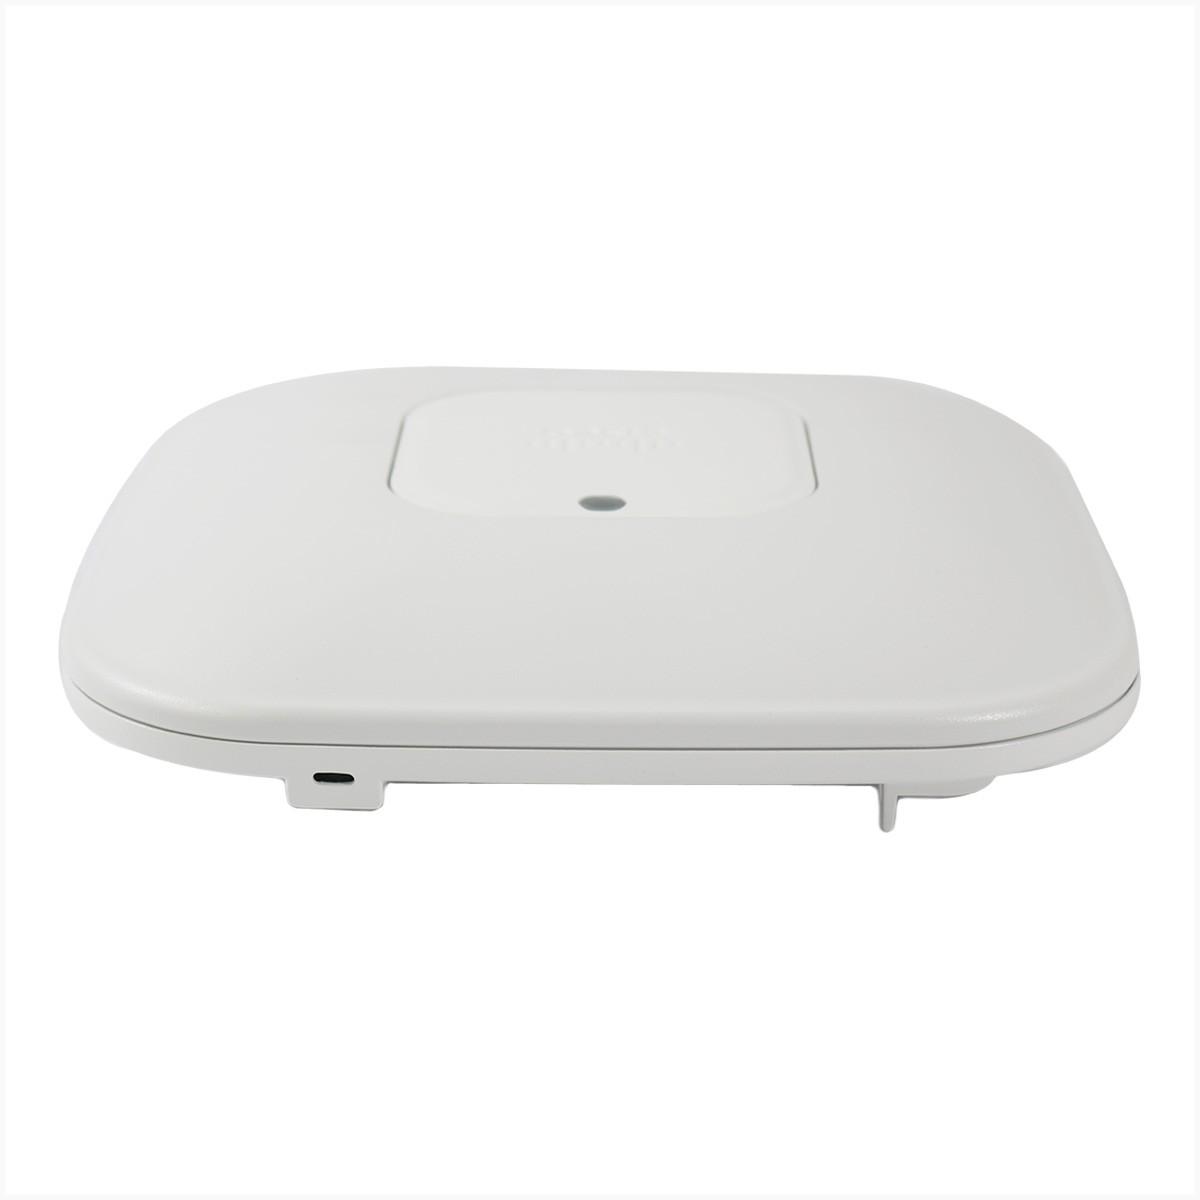 Access point cisco air-cap3602i-tk9 - usado